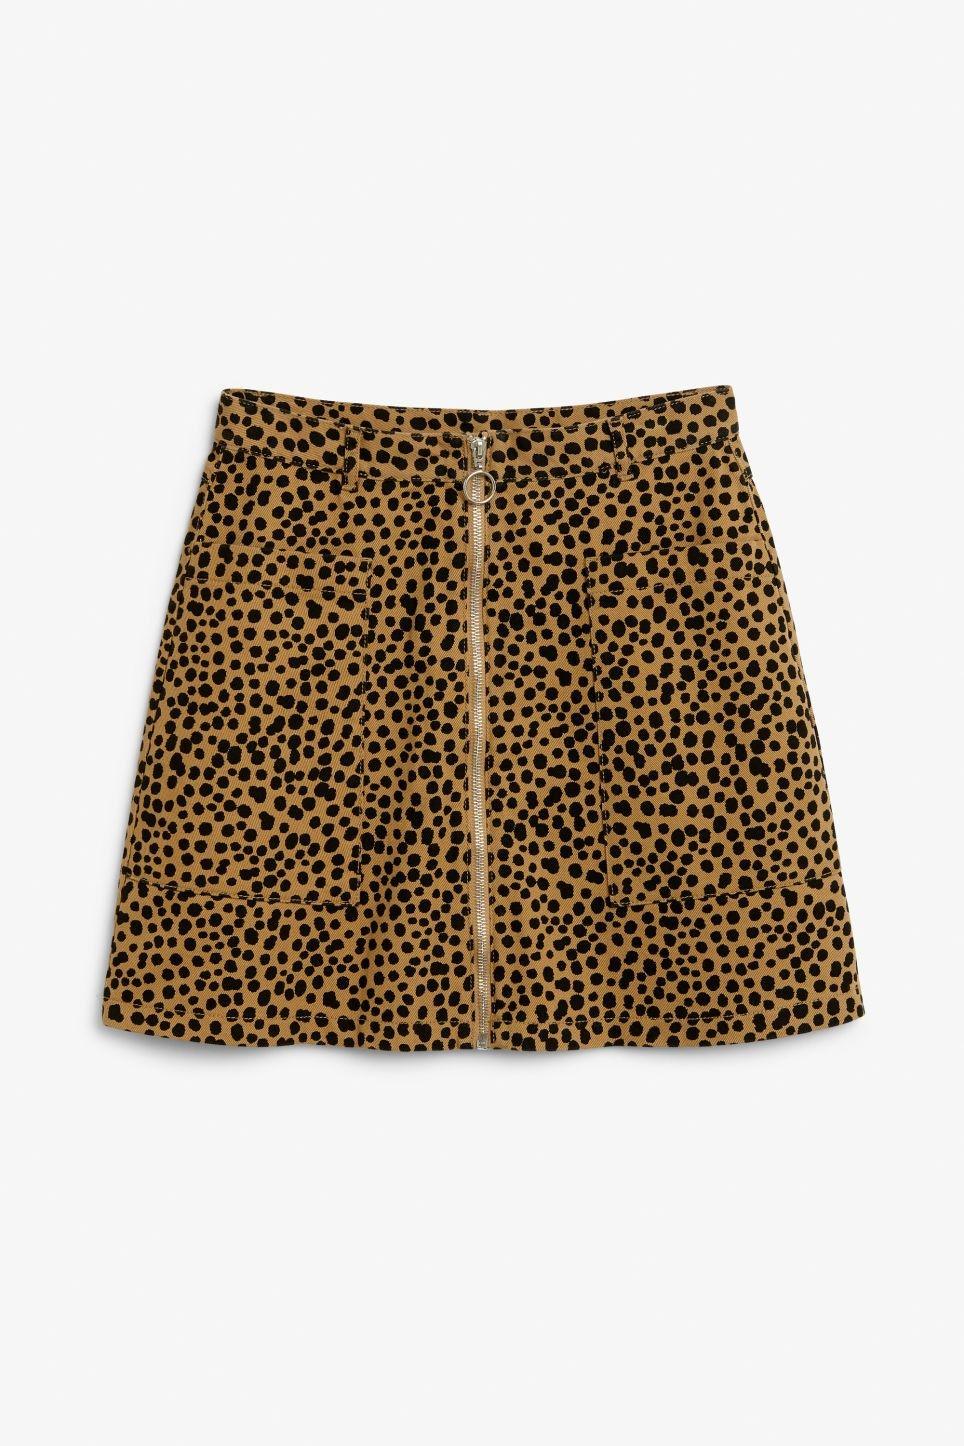 731c7a1ef030 Pin tillagd av Lisa på Höst 2016 | Mini skirts, Leopard print skirt ...